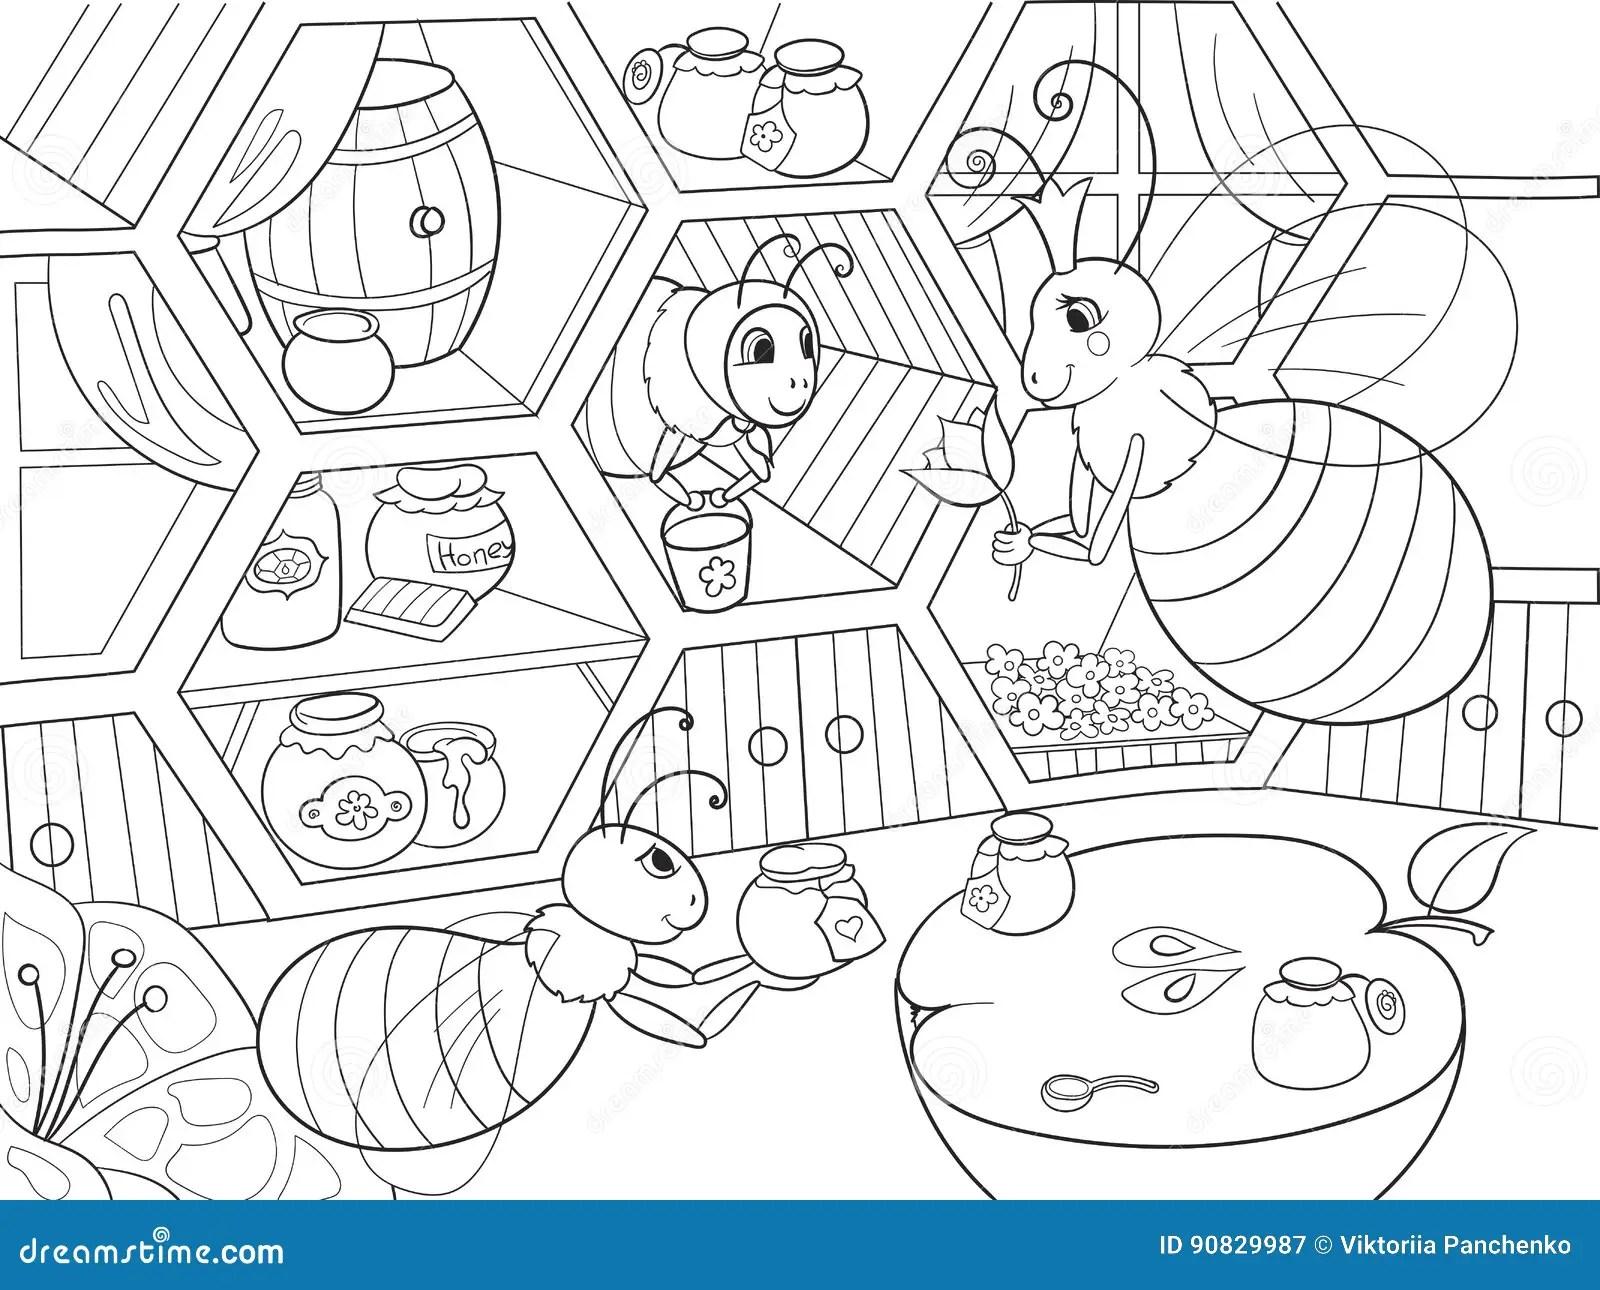 Honey Bee Insect Cartoon Illustration Vector Illustration